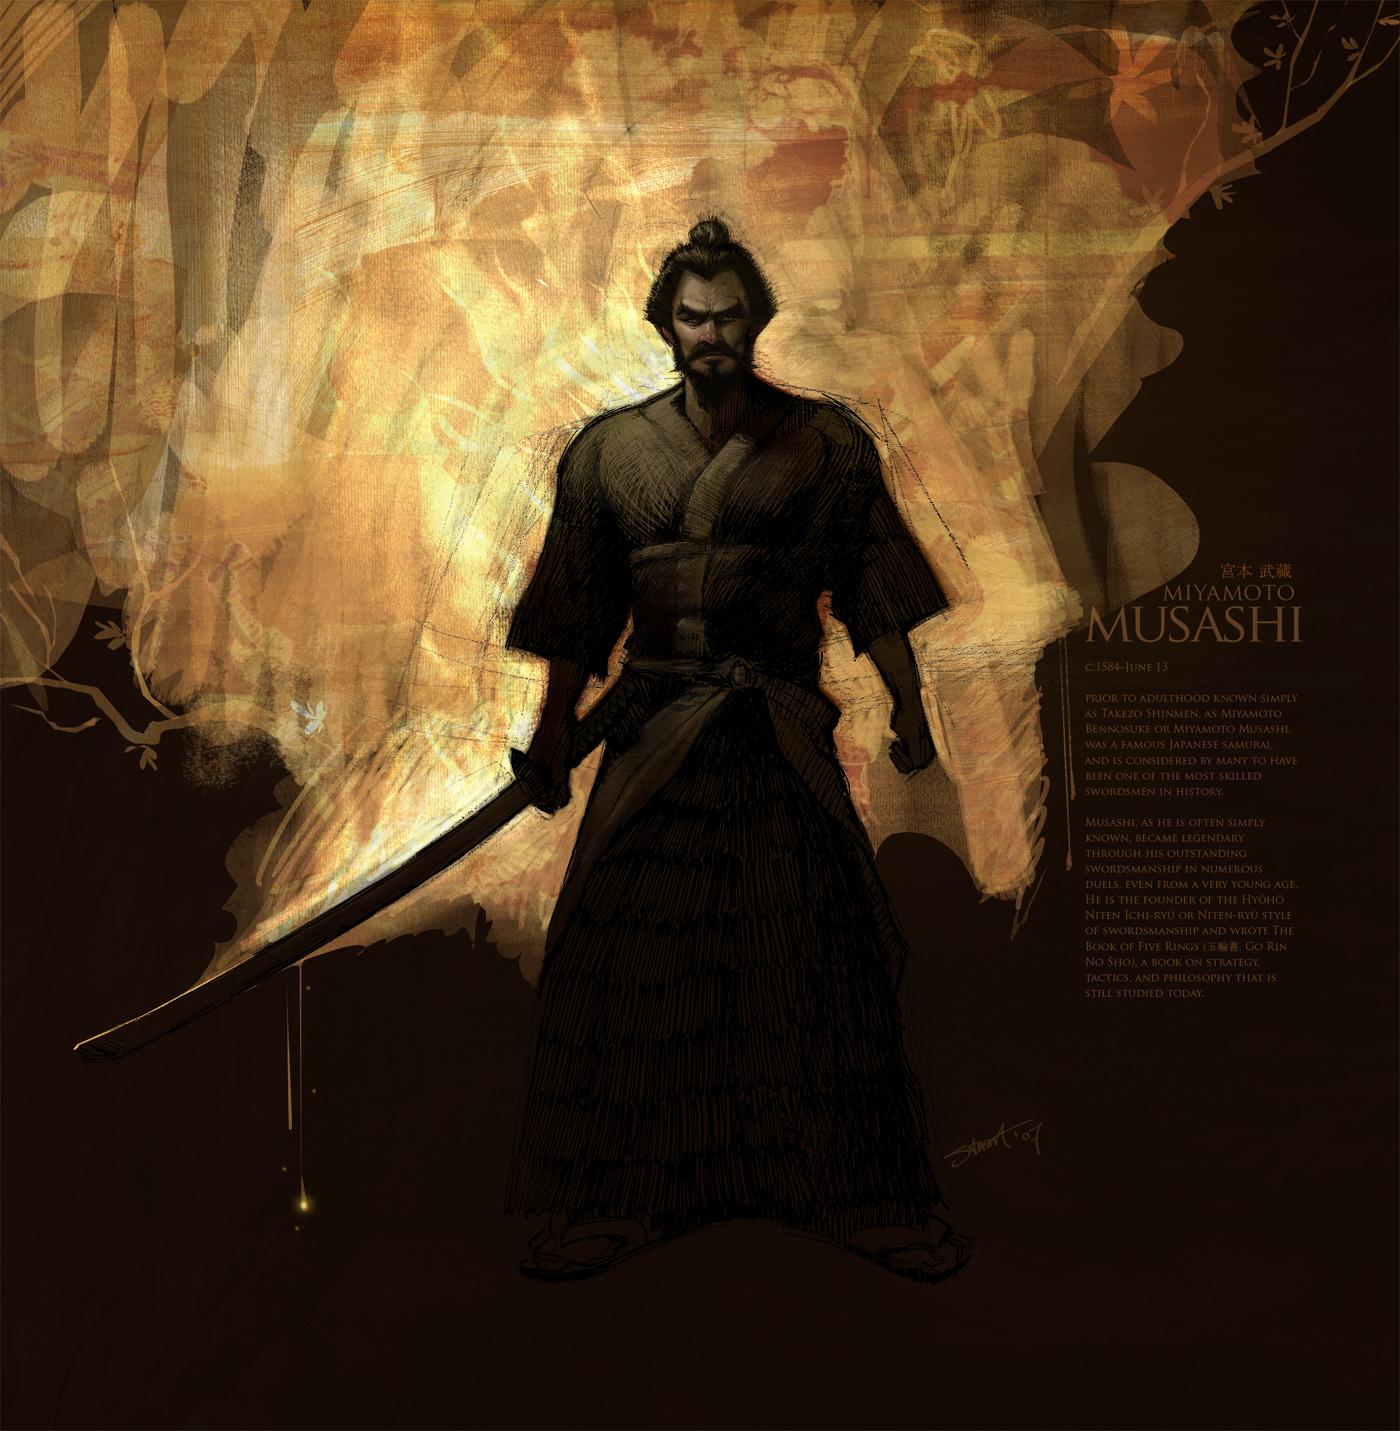 Imagenes de samurais